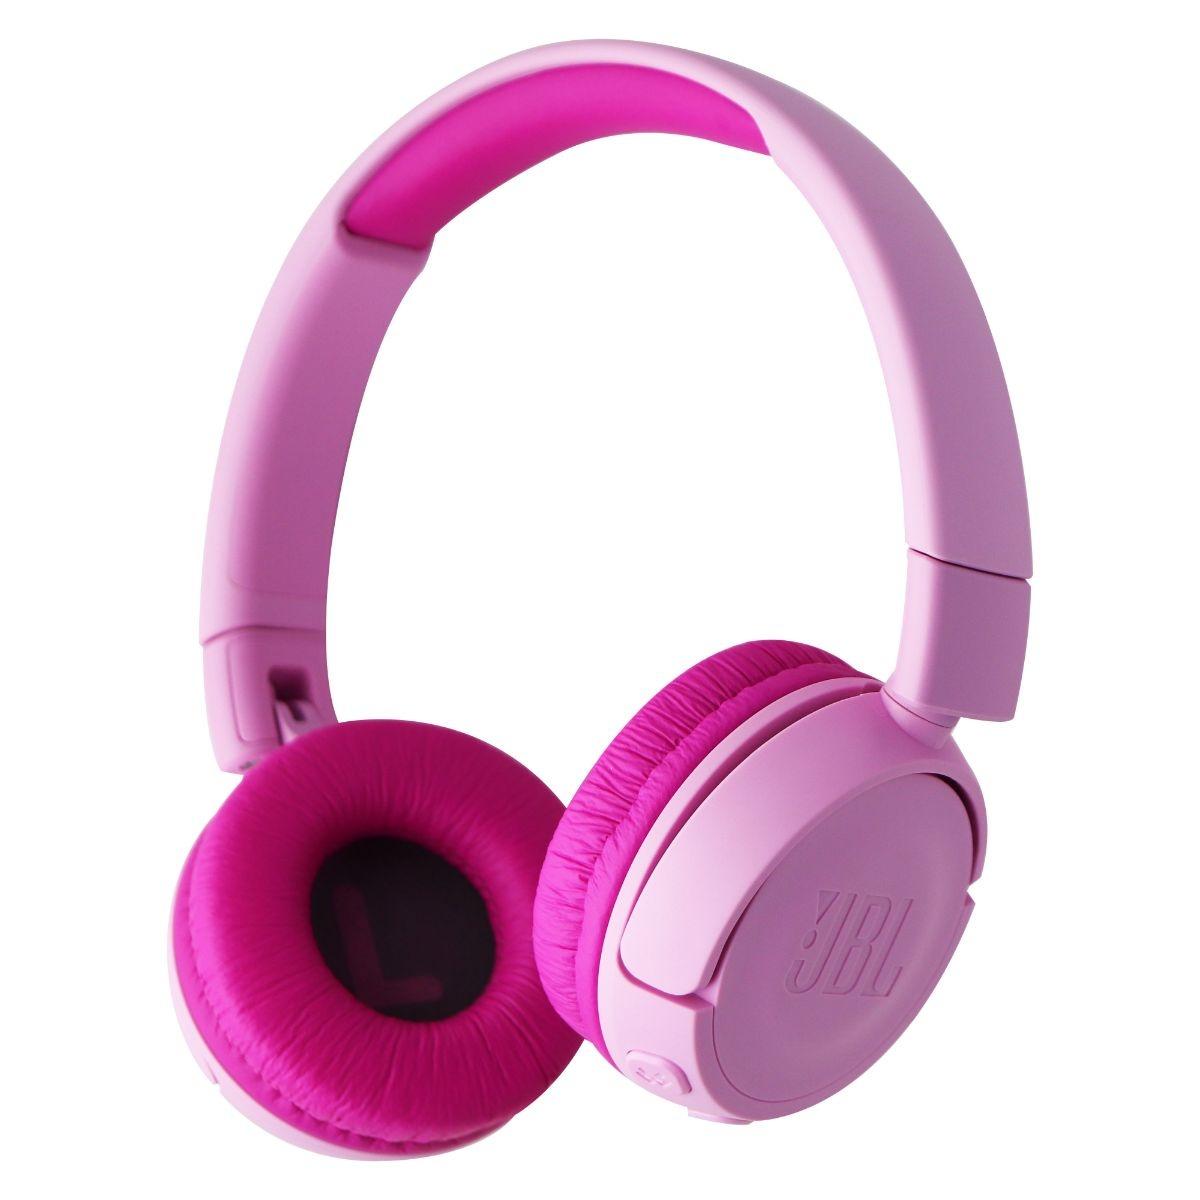 JBL Kids On-Ear Wireless Headphones with Safe Sound Technology - Pink JR300BT